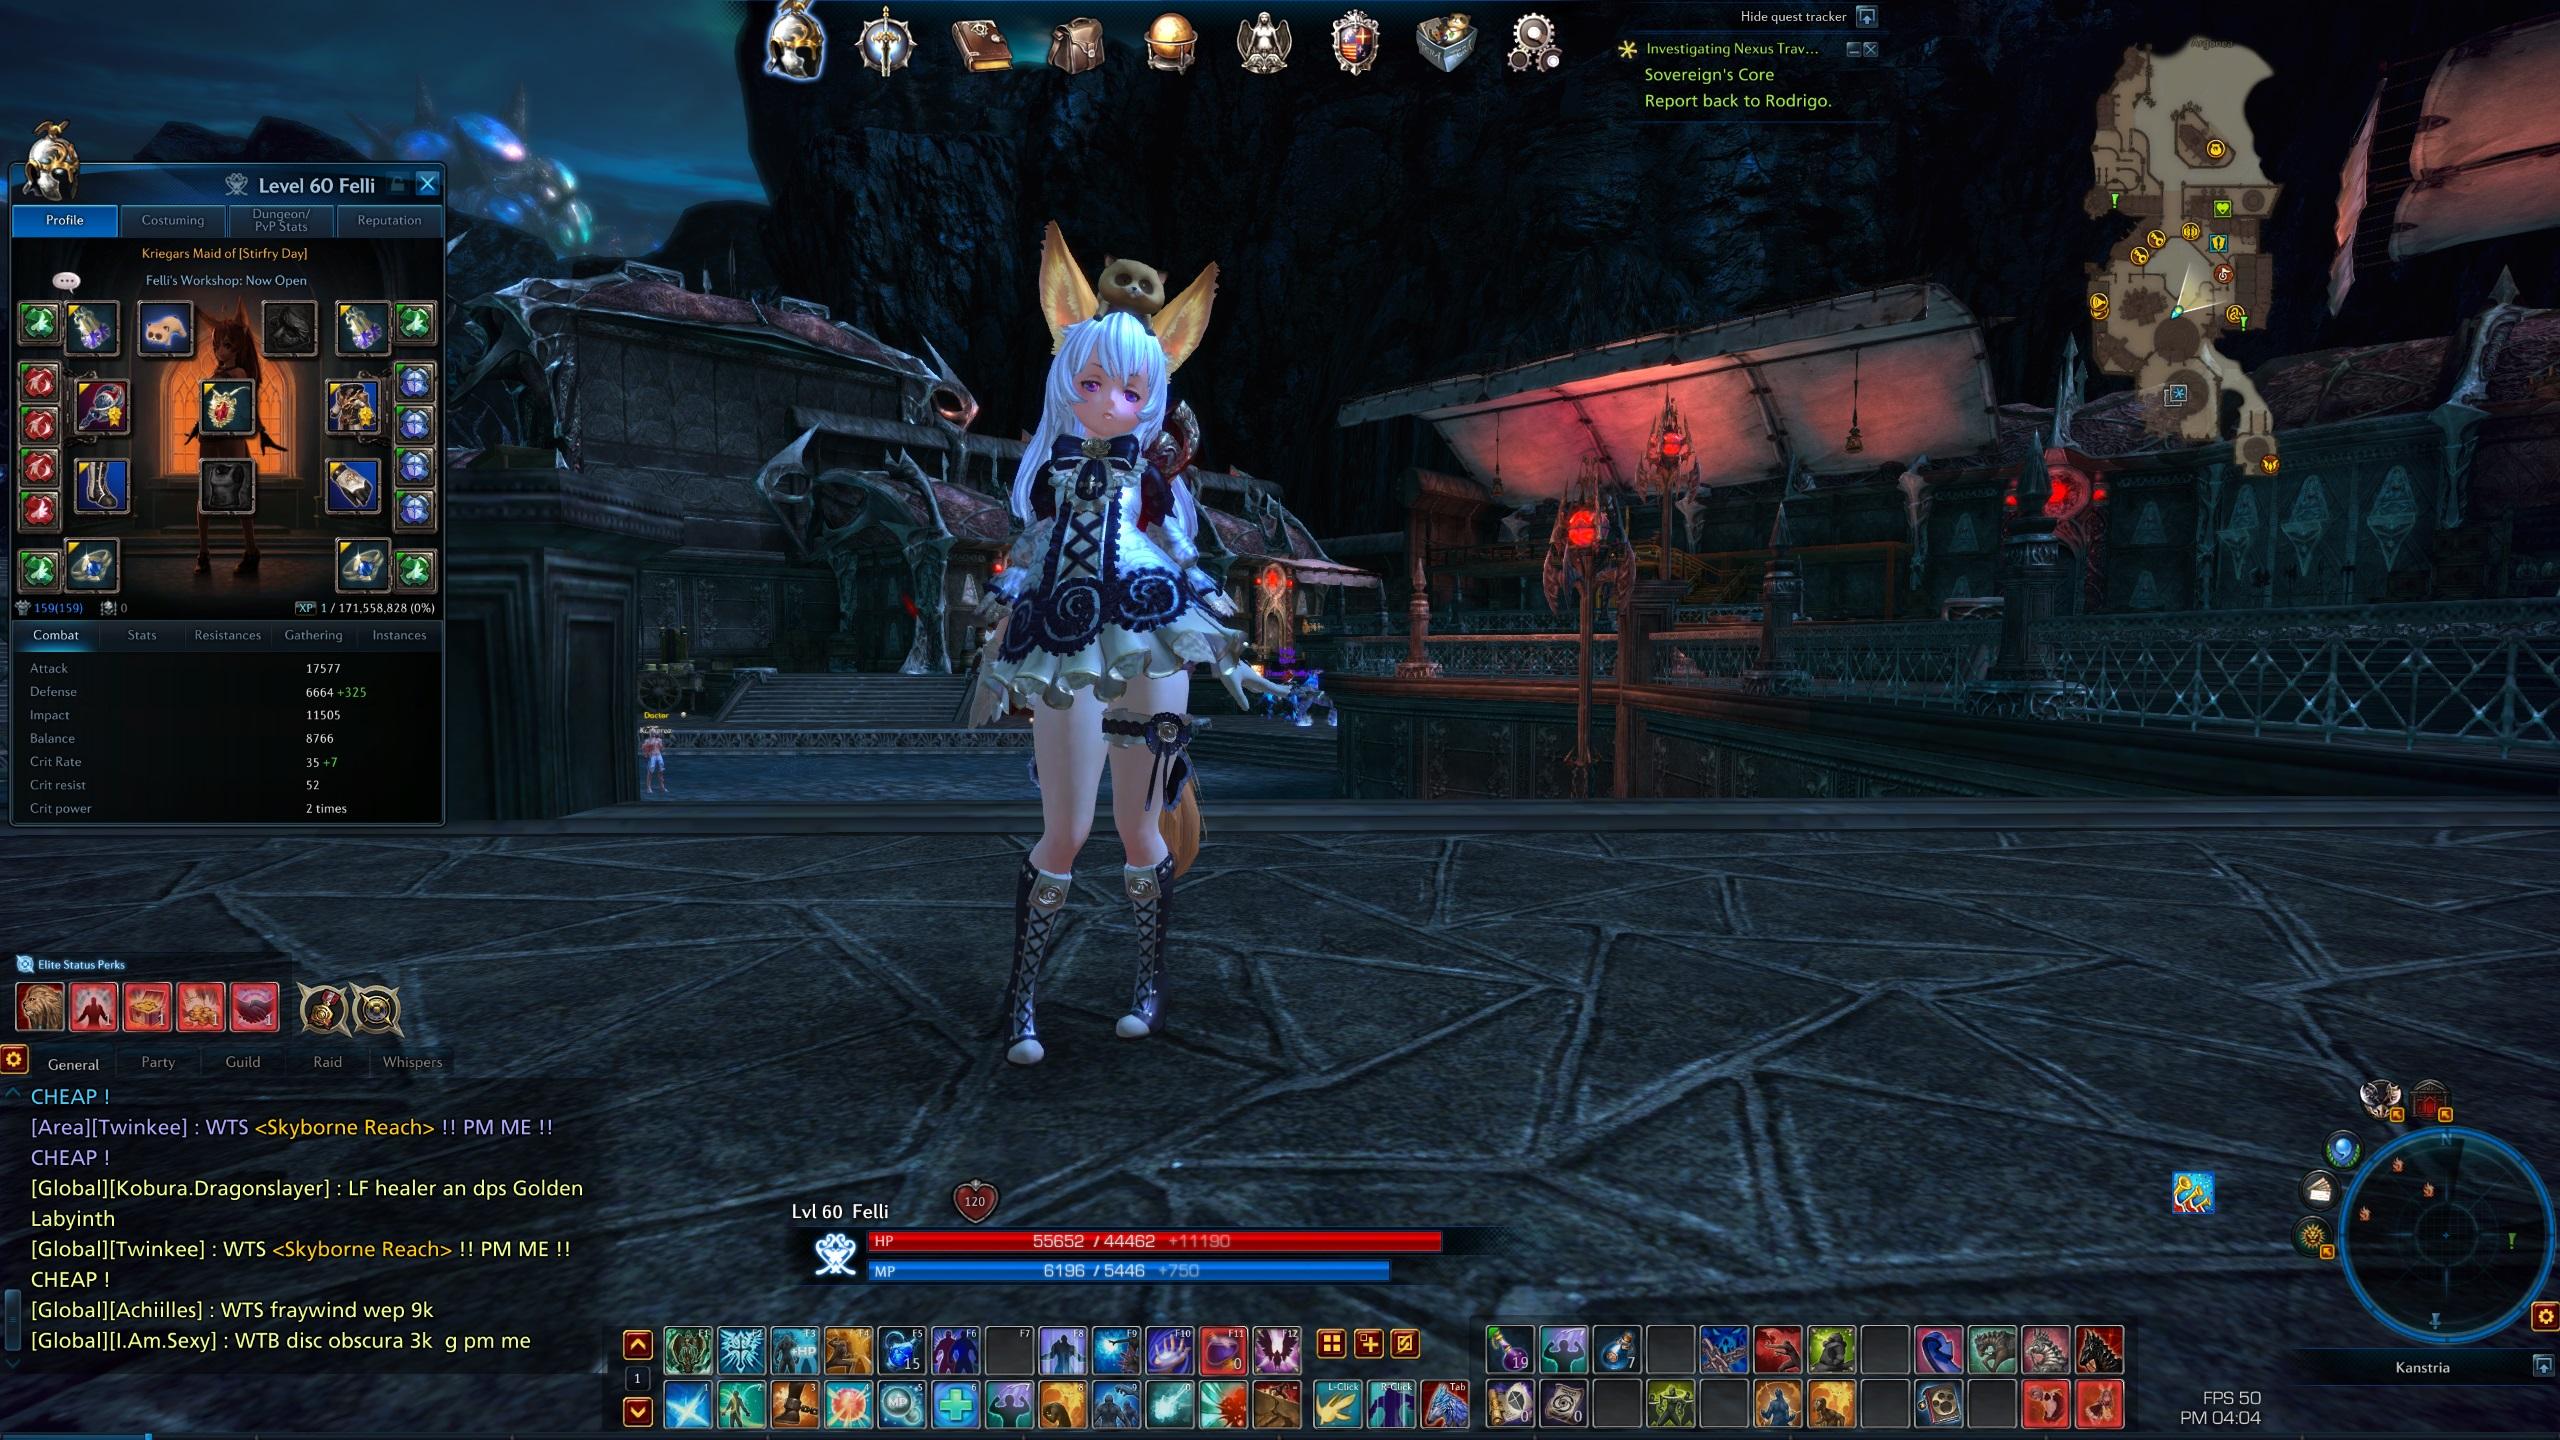 eddard games carried praetor secret recent accomplishment thread tera